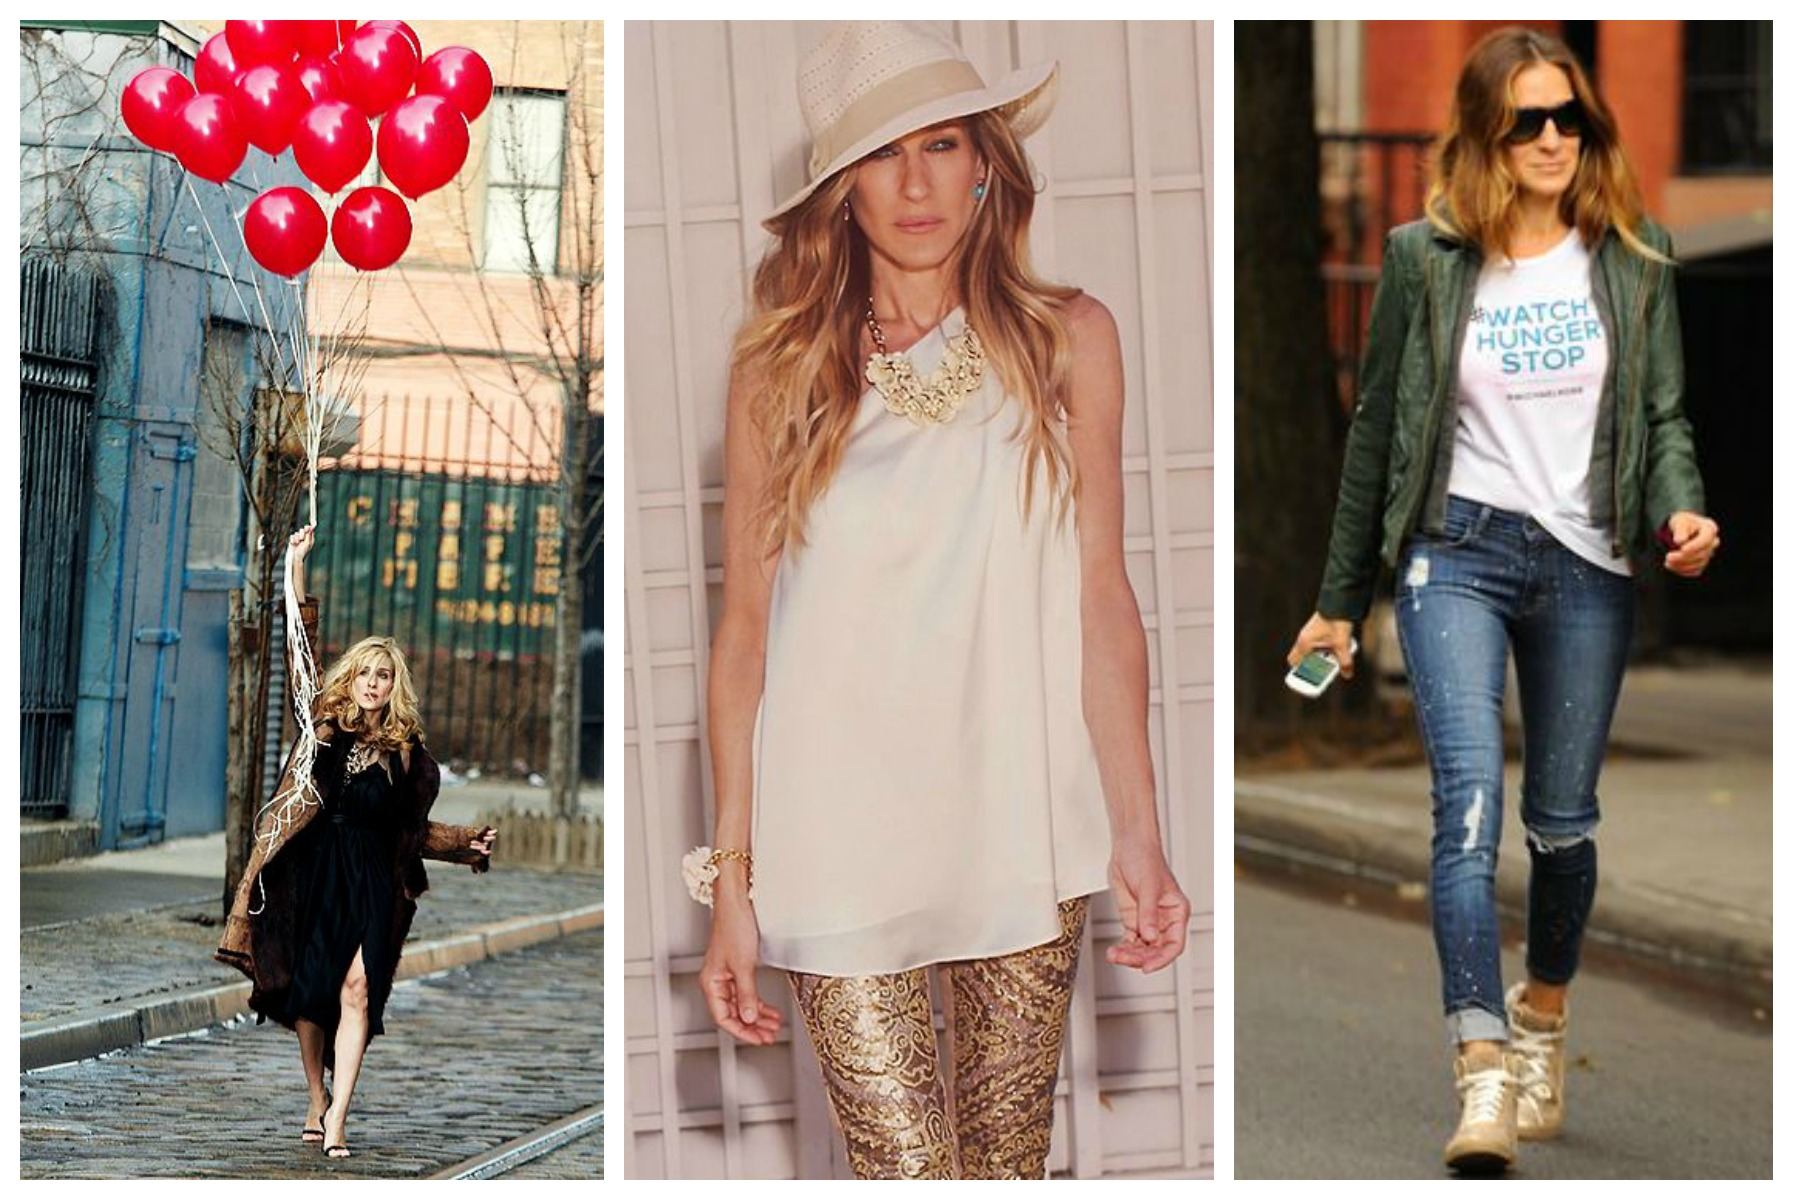 vith.es consultoria de moda estilo outfit sarah jessica parker style looks sex and the city antonio pozuelo (5)